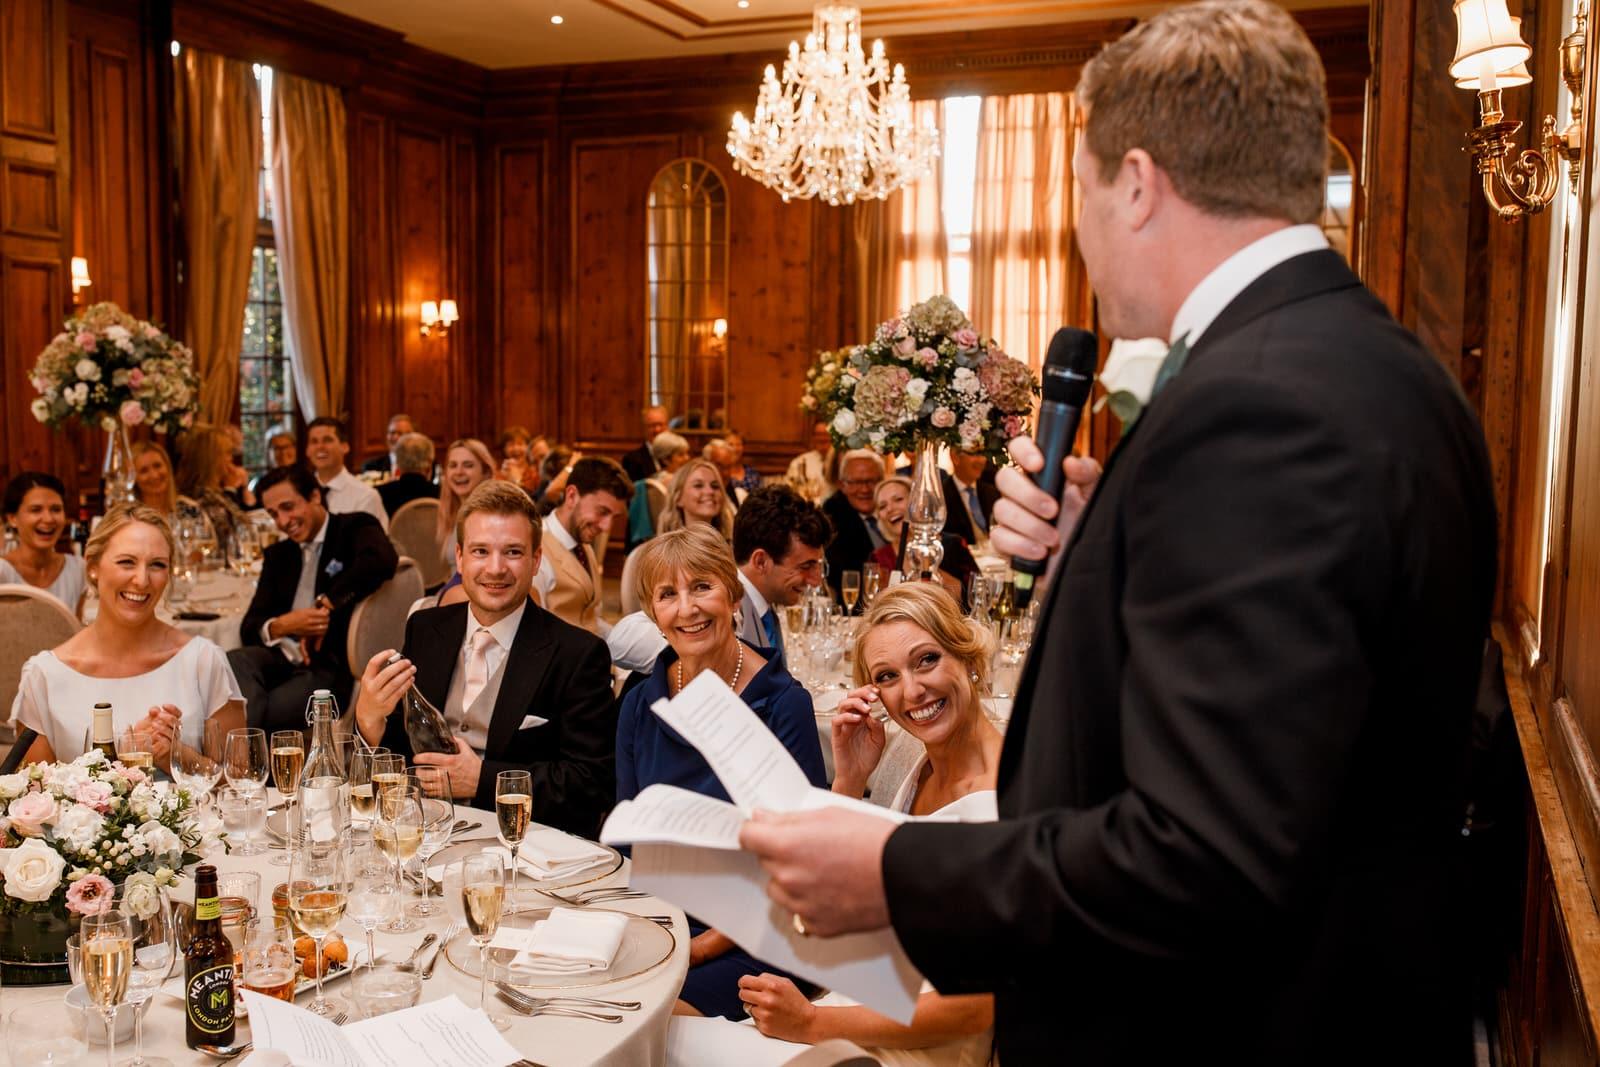 bride looking at groom during wedding speech